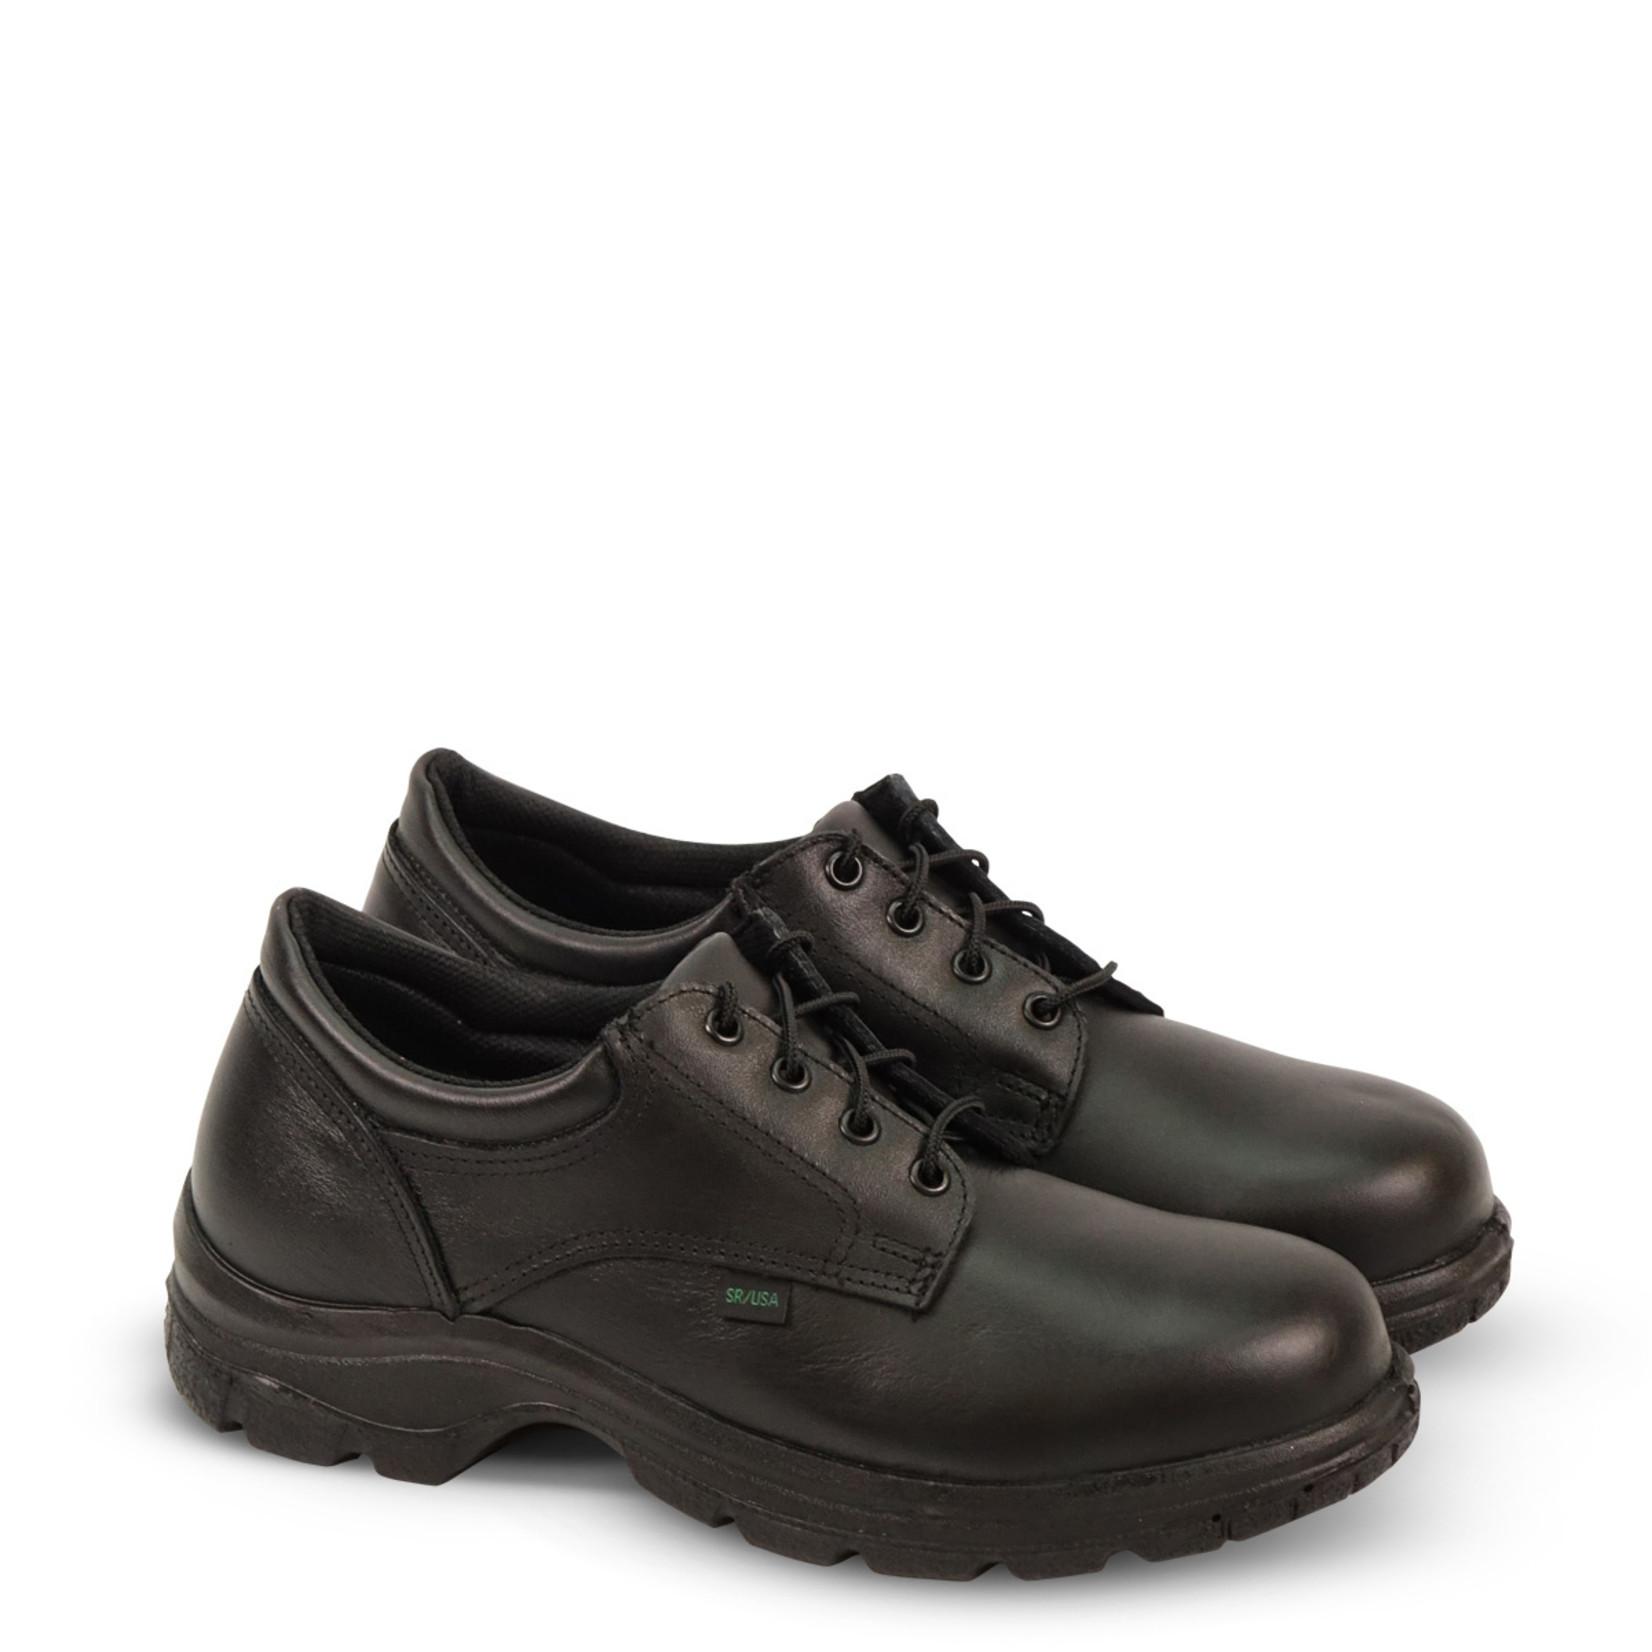 Thorogood Men's Thorogood Work Shoe PlainToe Oxford  Soft Streets 834-6905